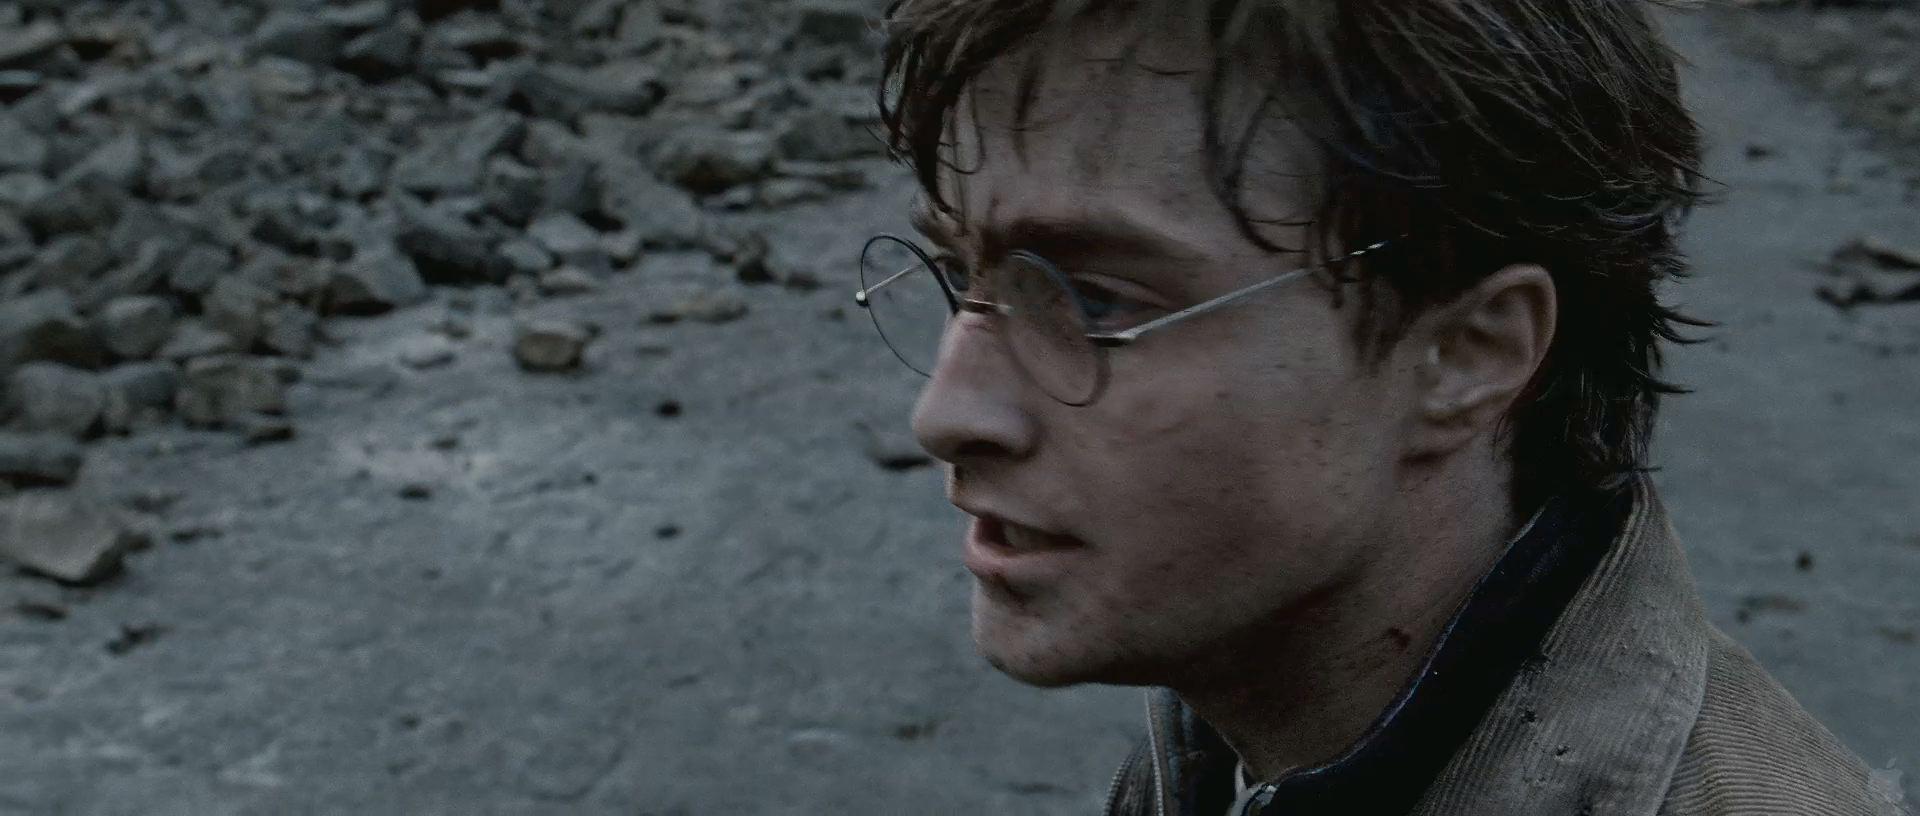 Harry Potter BlogHogwarts HP7 2 Trailer 29